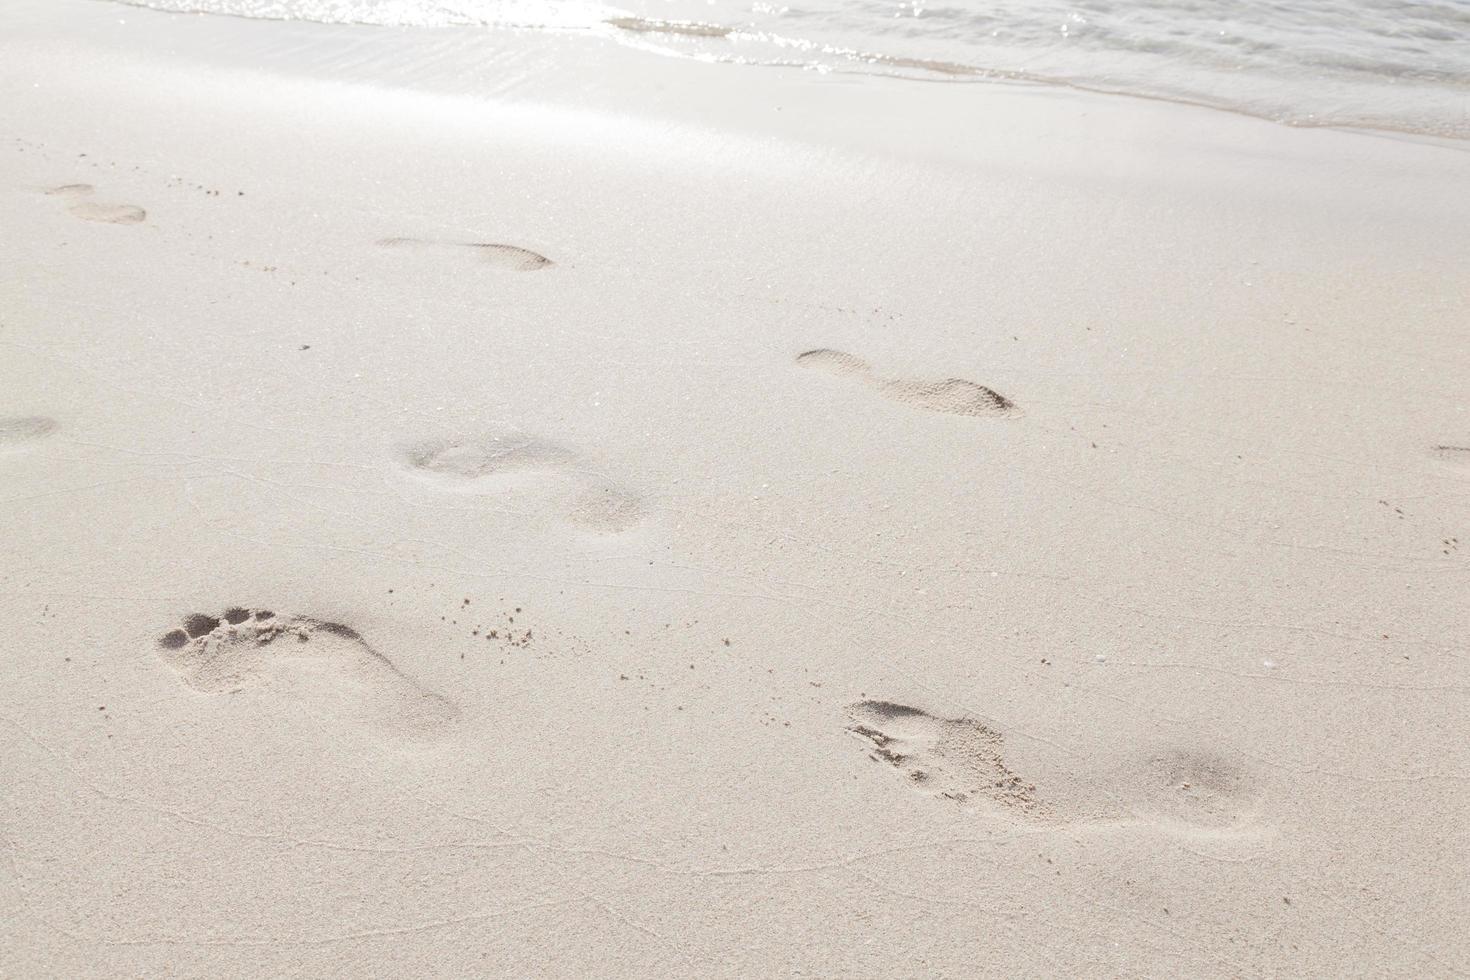 Fußspuren im Sand am Strand foto